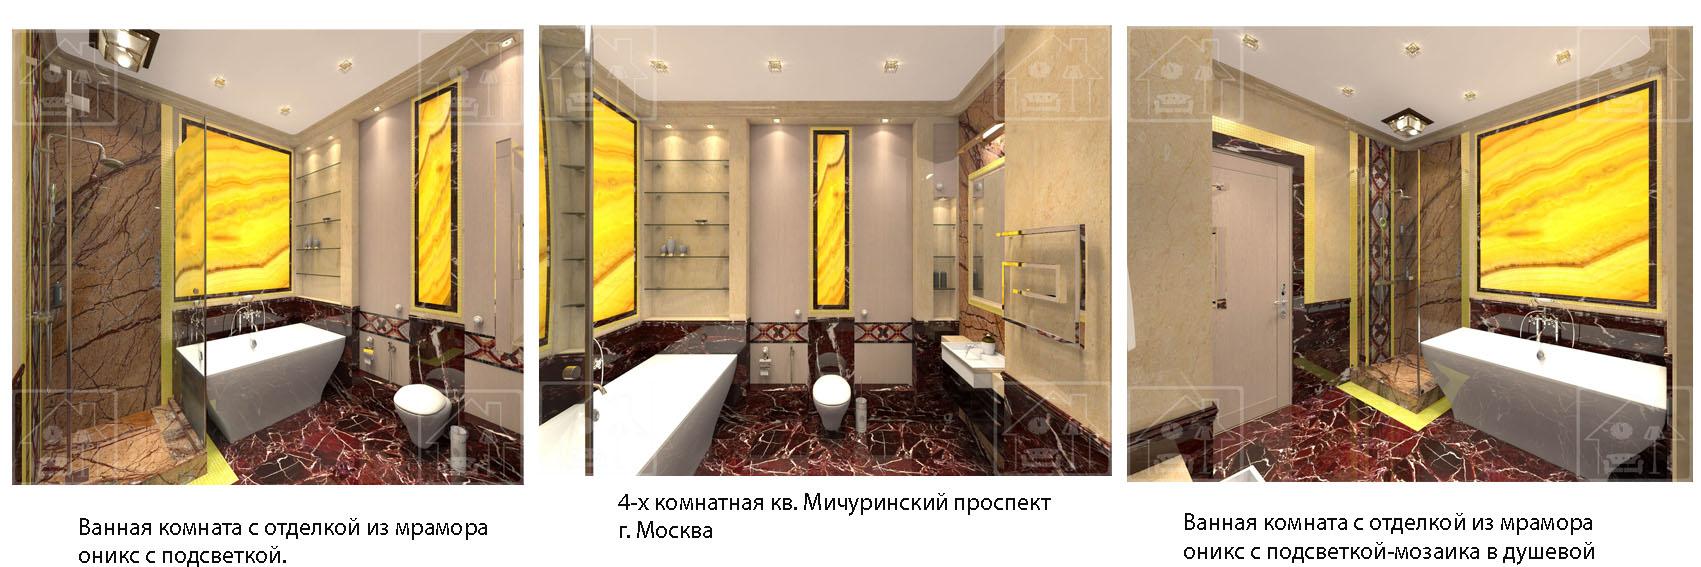 Ванная комната с отделкой из мрамора 1